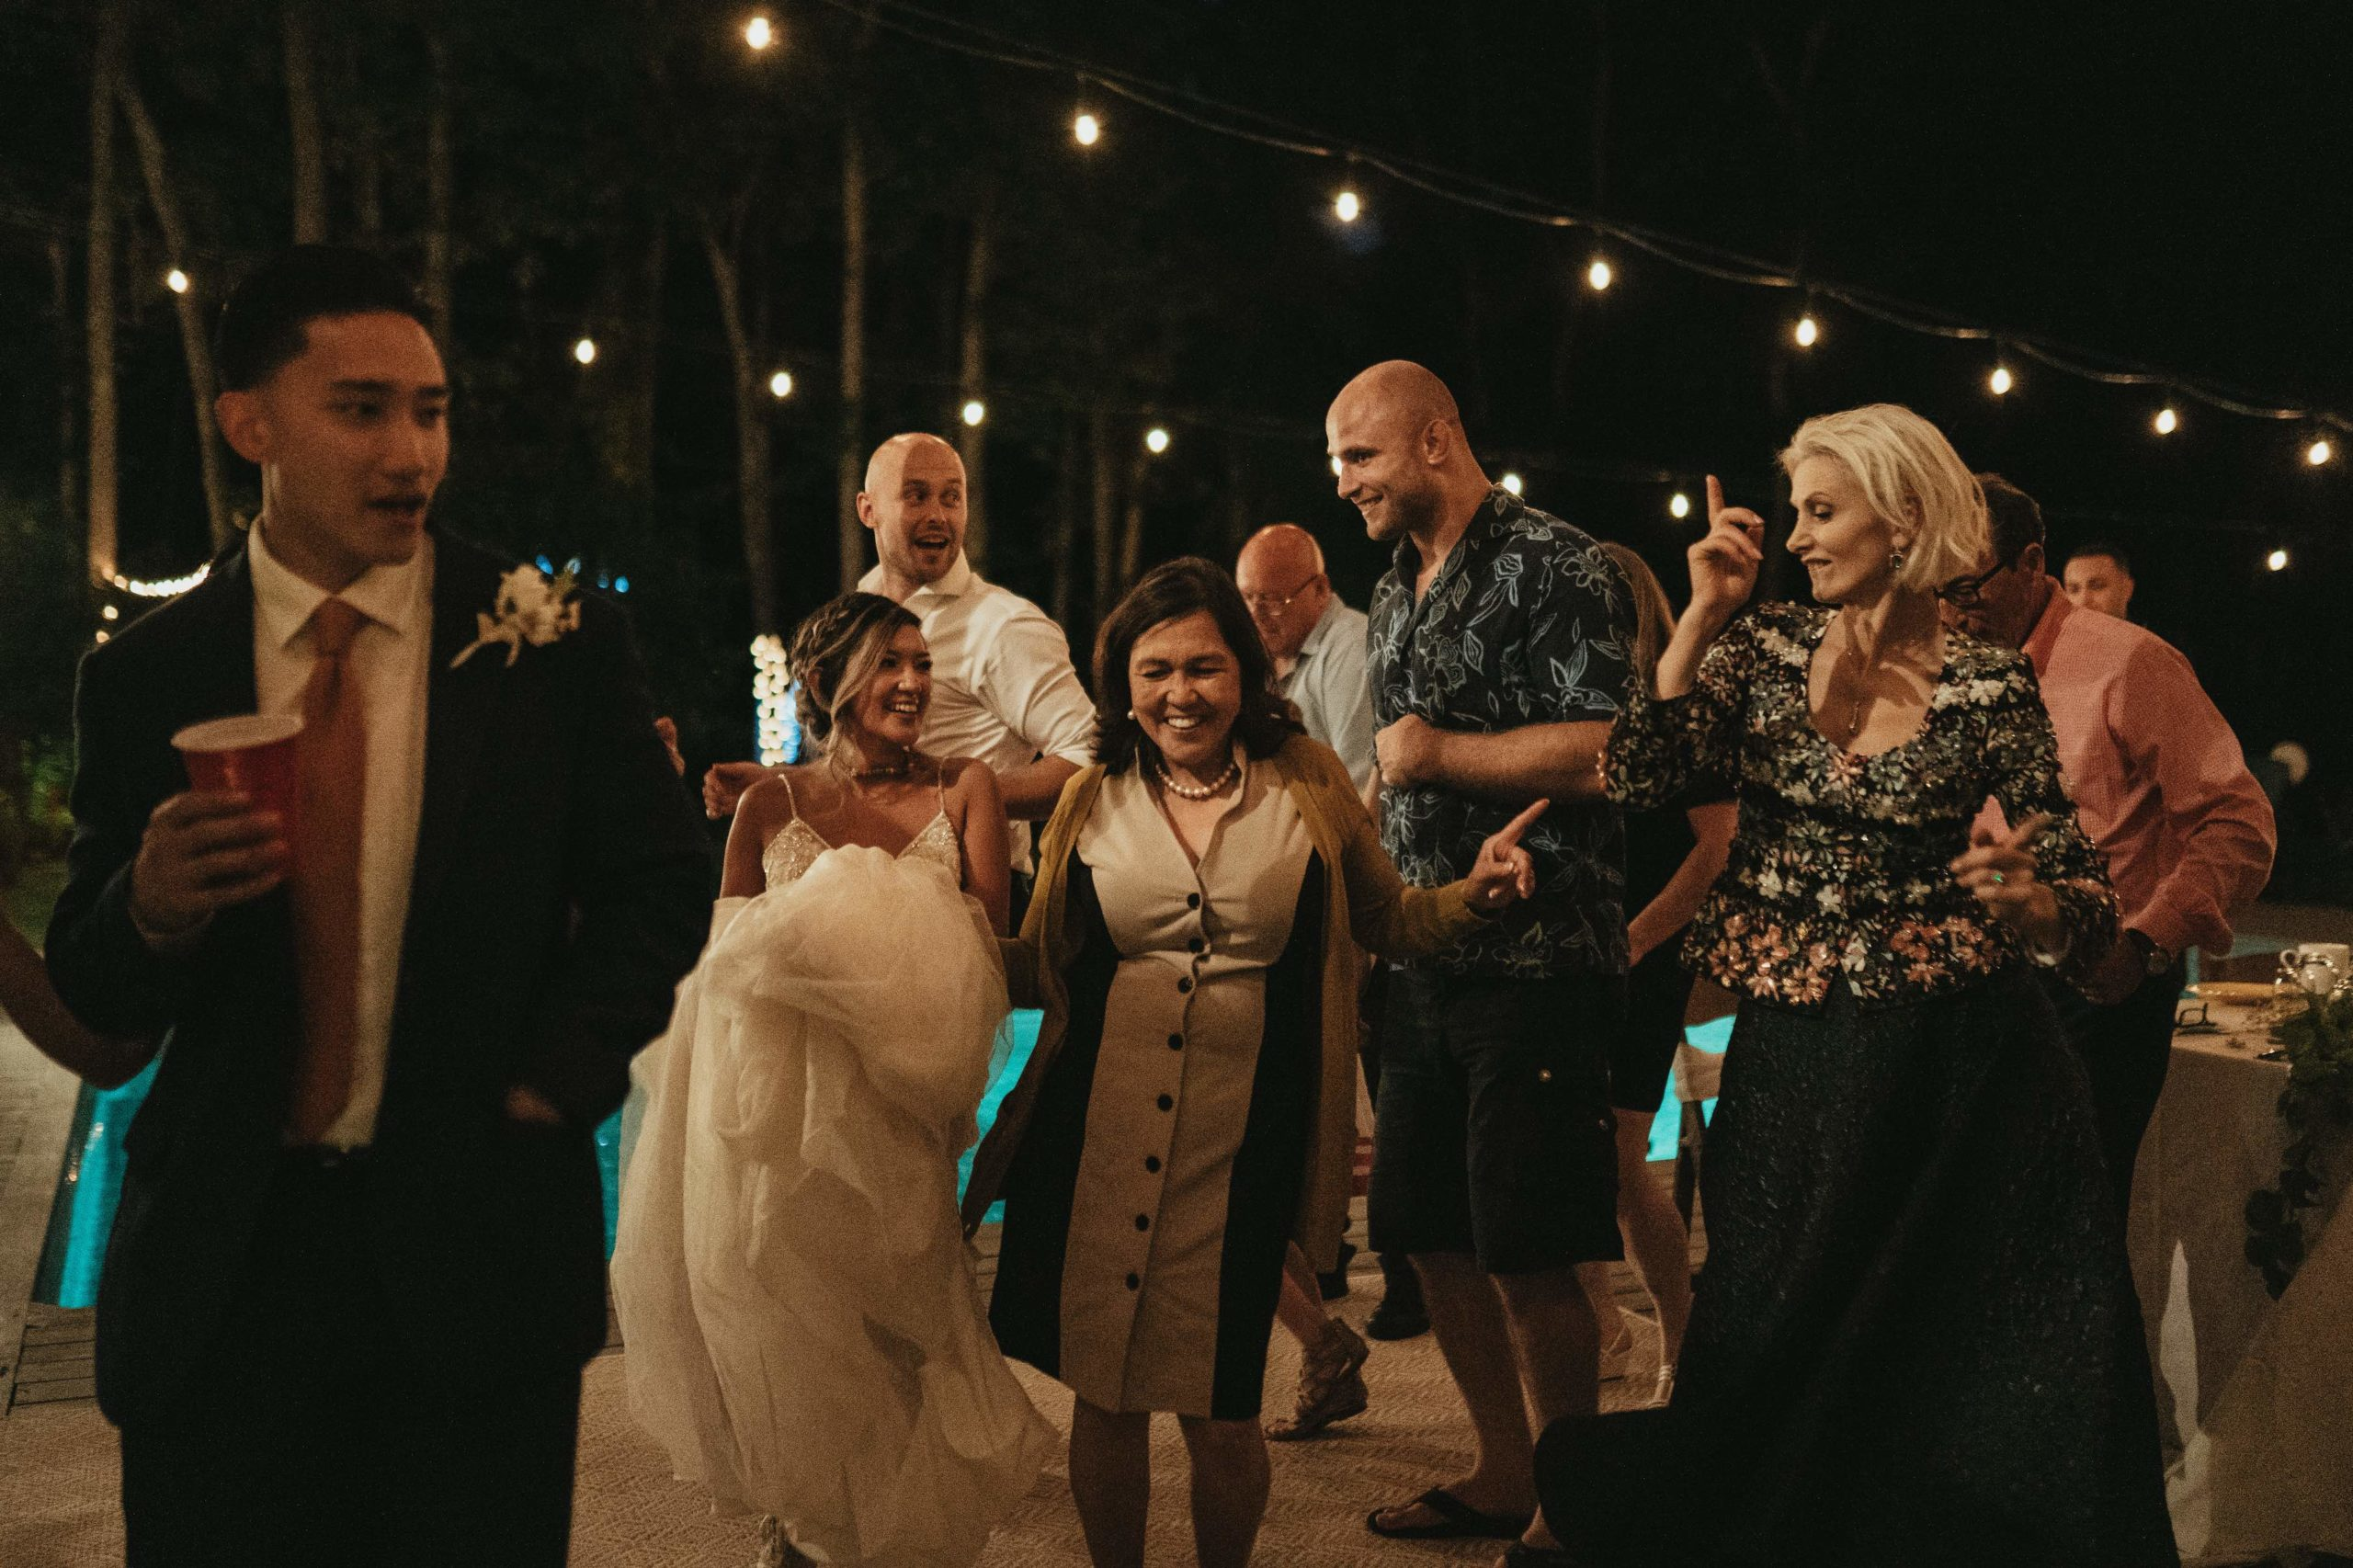 Family dancing at night